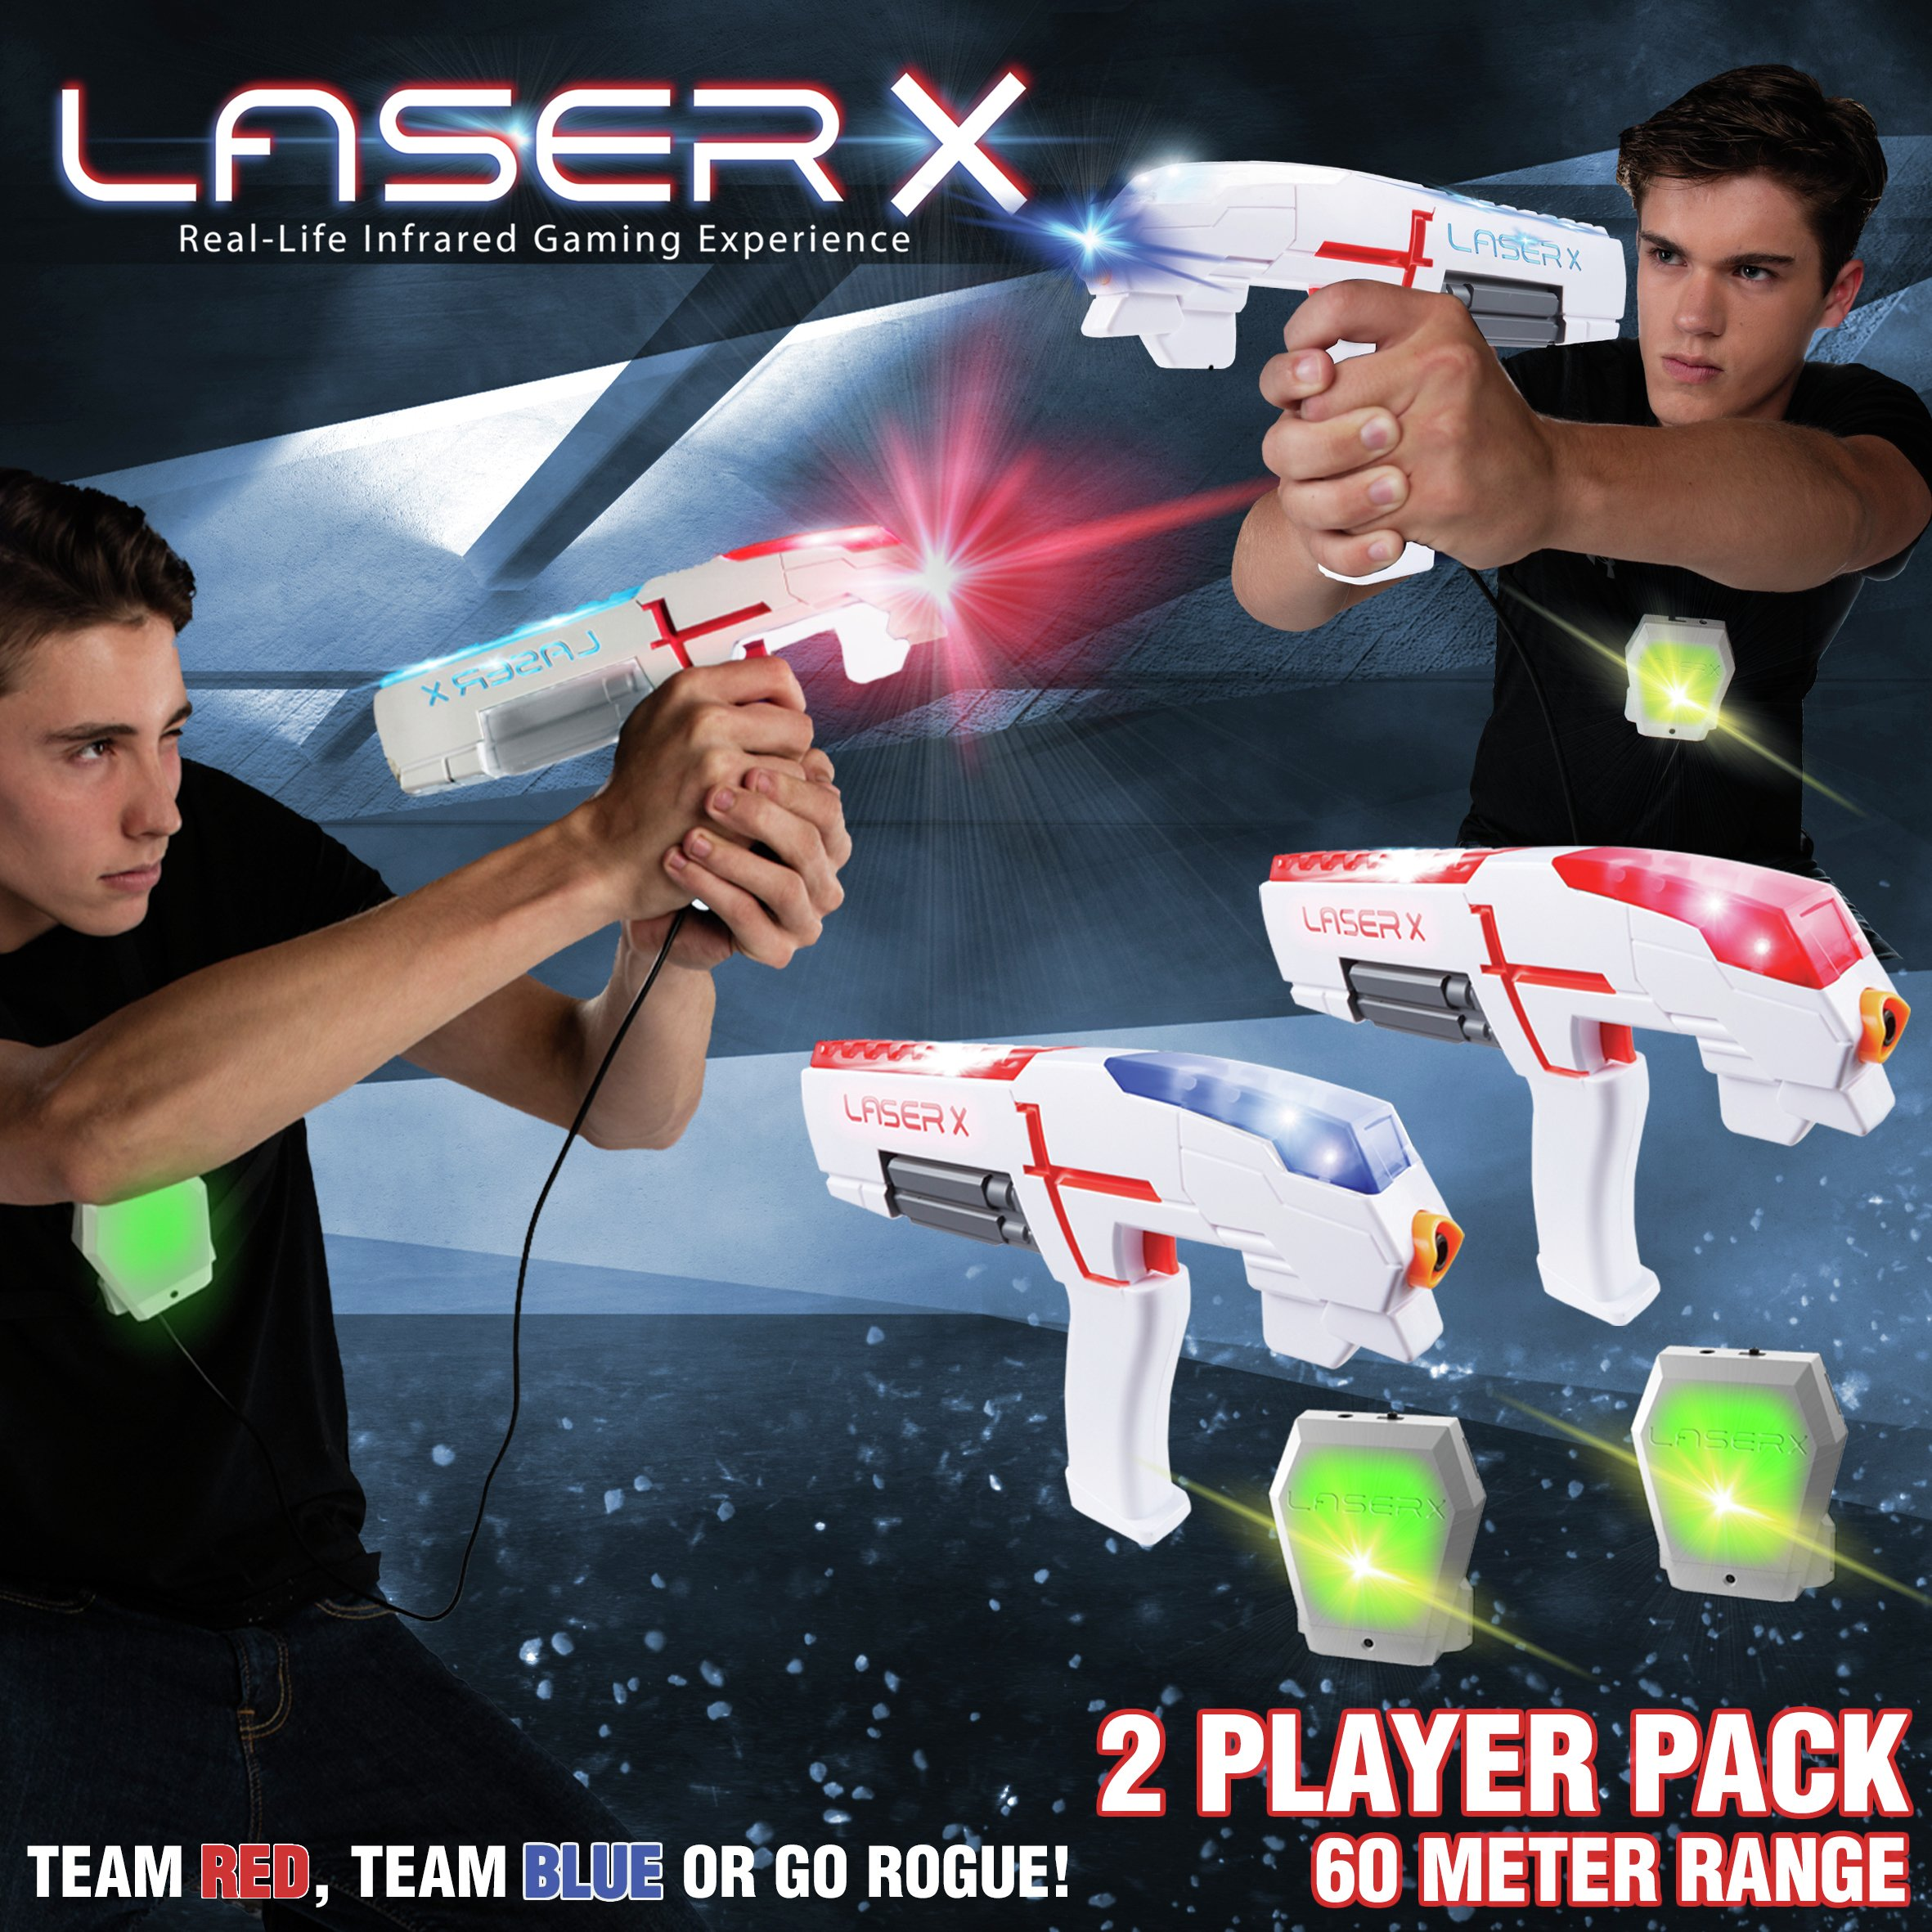 Laser X Laser Gaming Set - 2 Player Pack